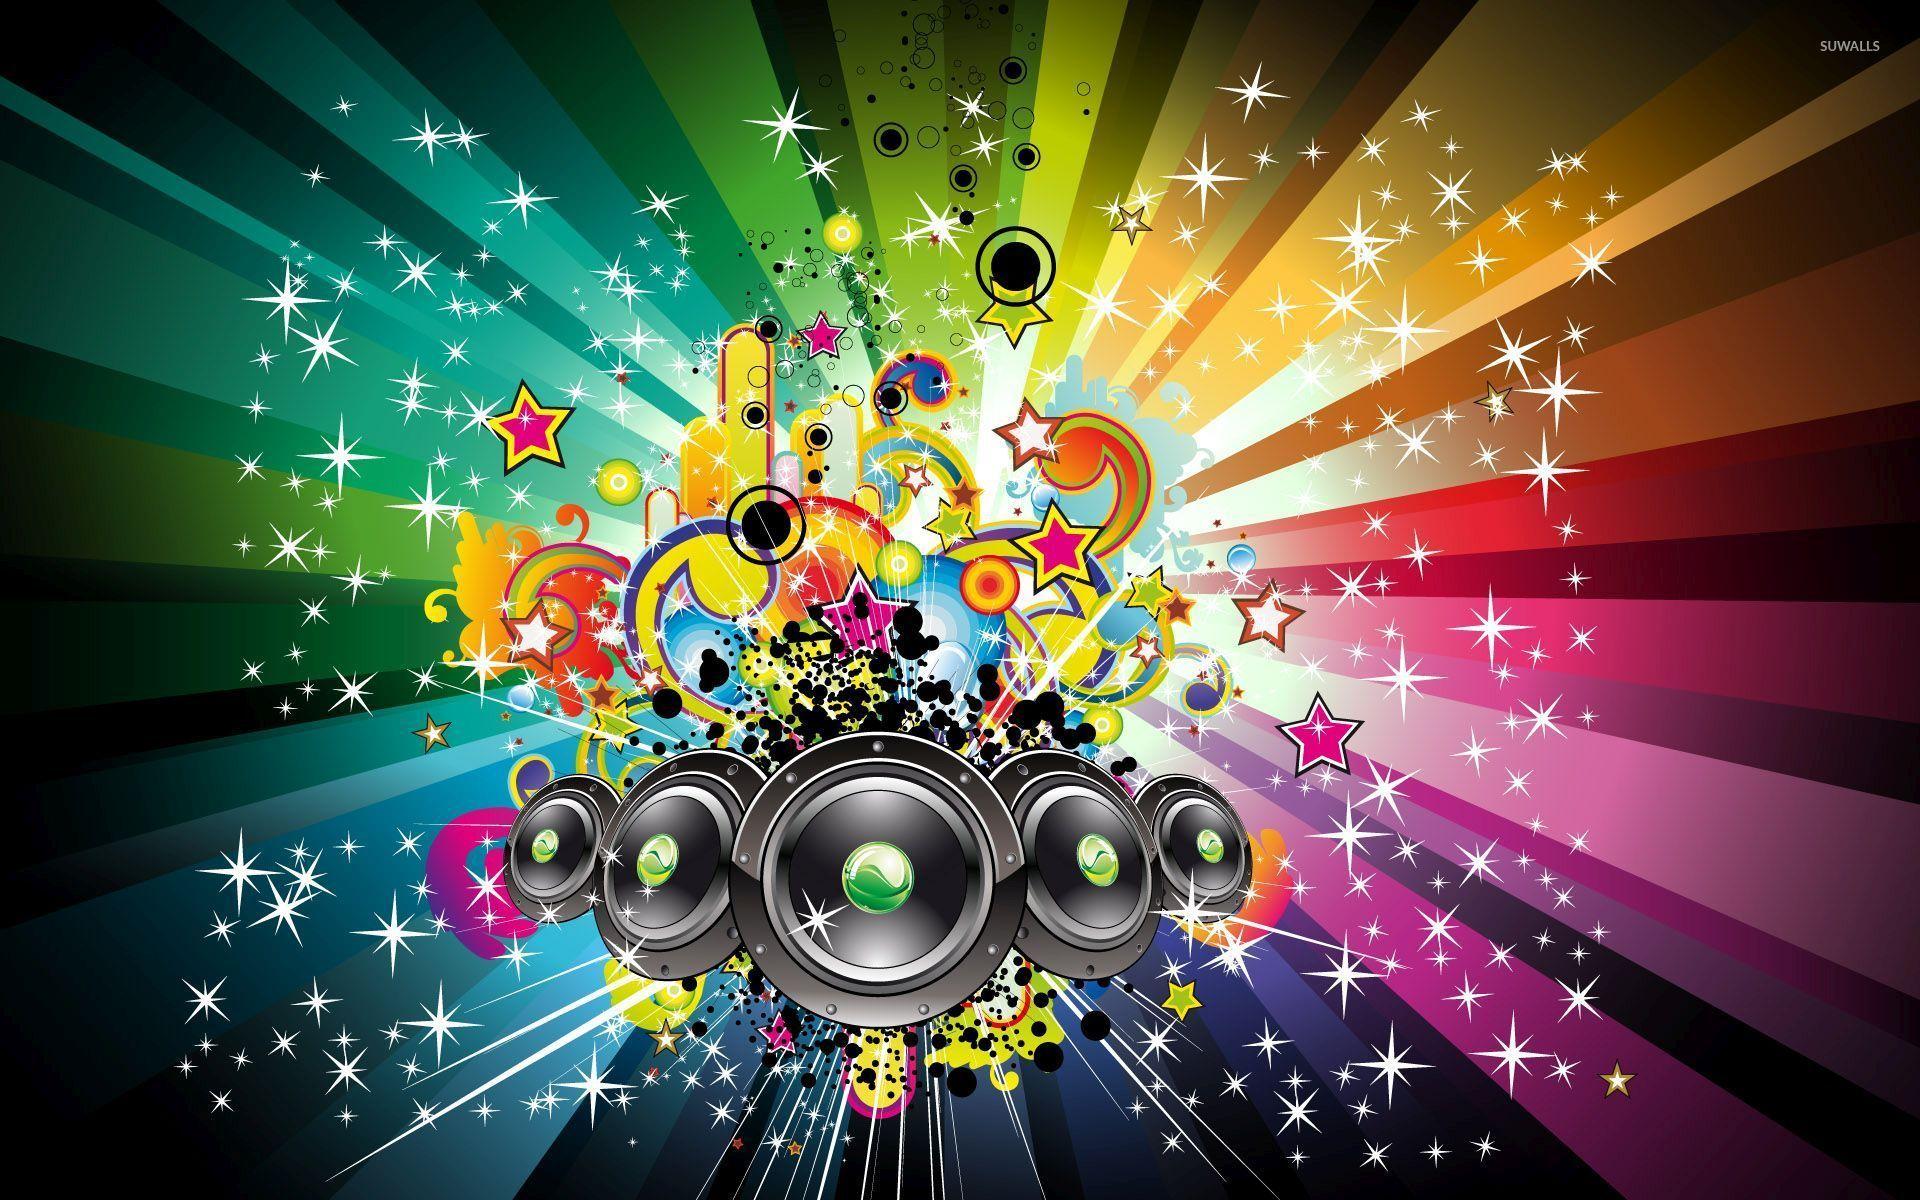 Magic Of The Music Wallpaper